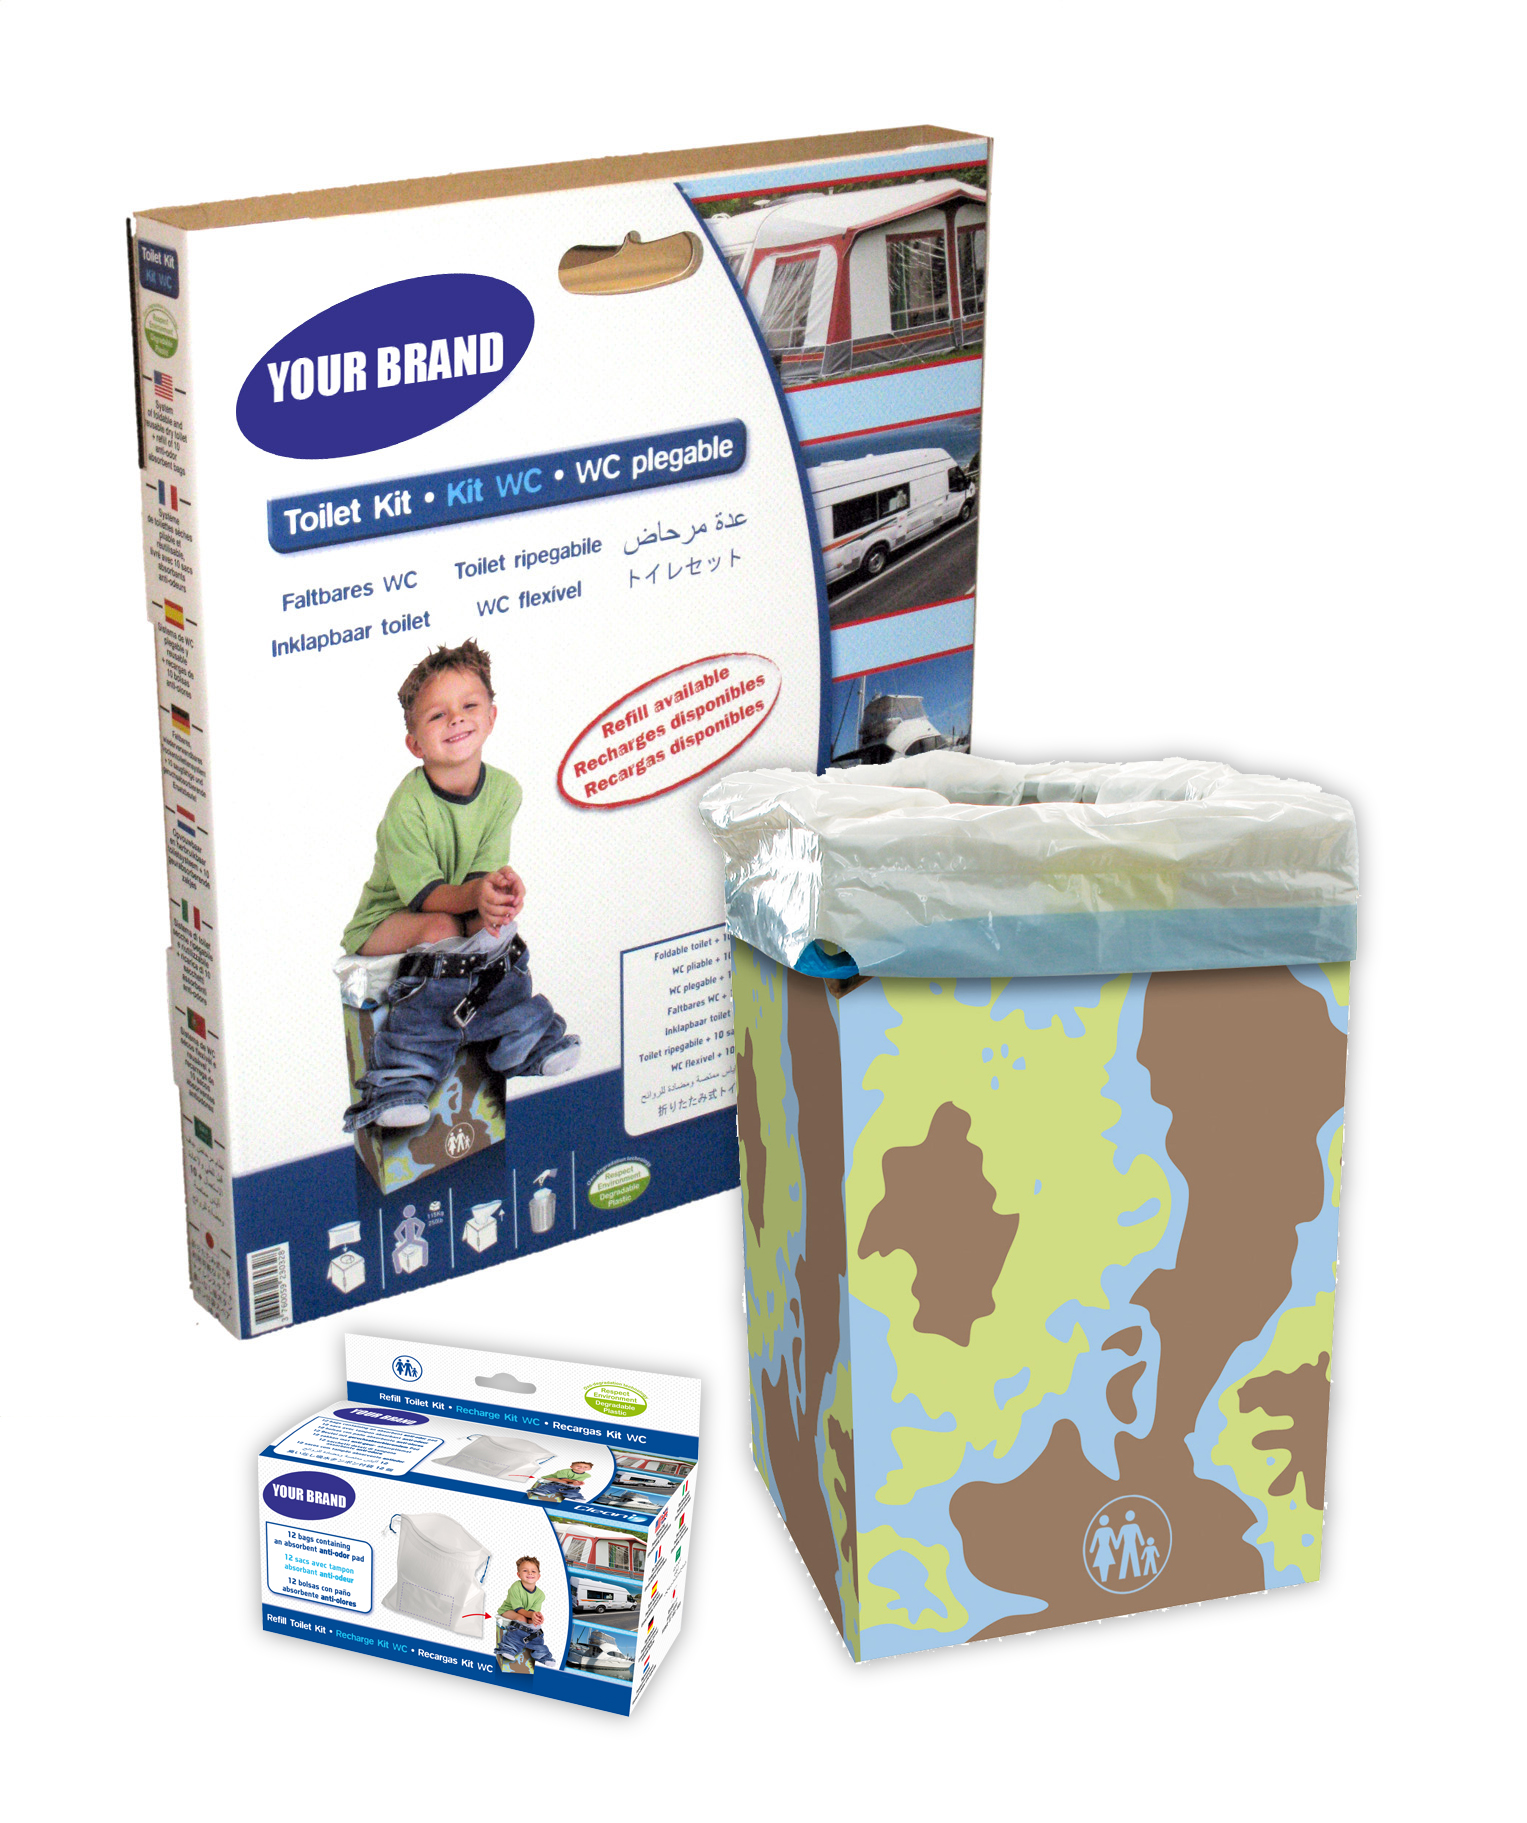 toilette s che pliable toilette seche jetable. Black Bedroom Furniture Sets. Home Design Ideas